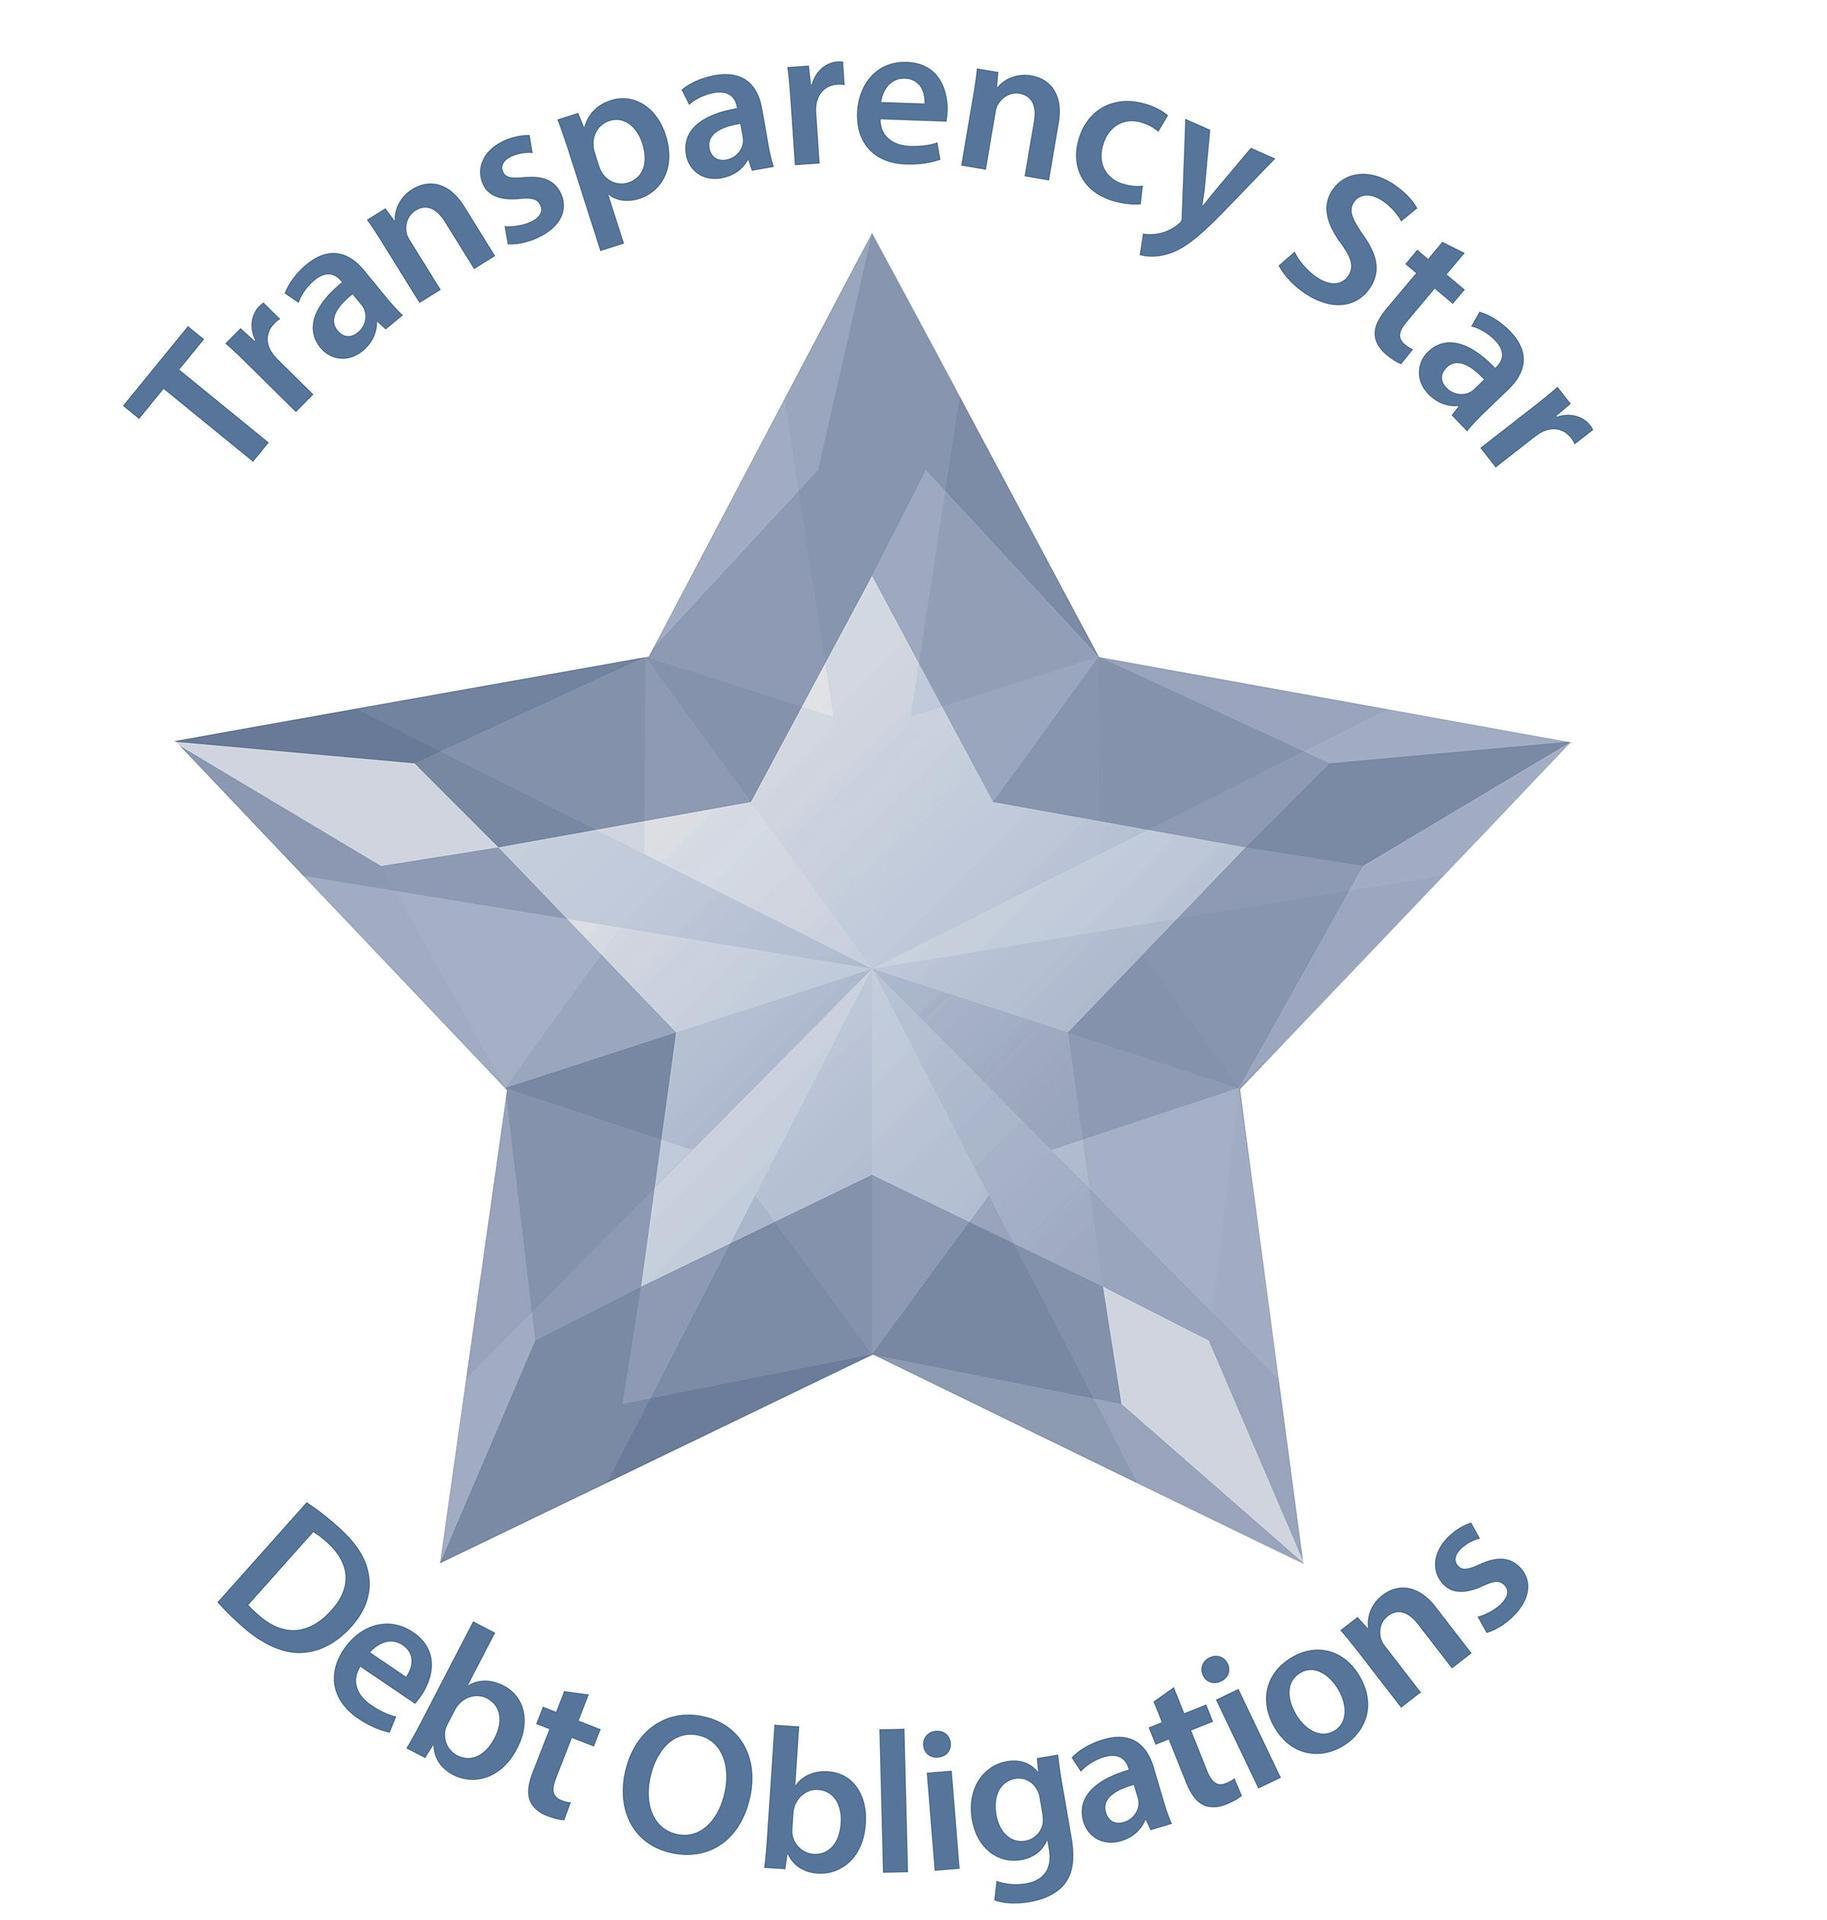 Debt Transparency Star